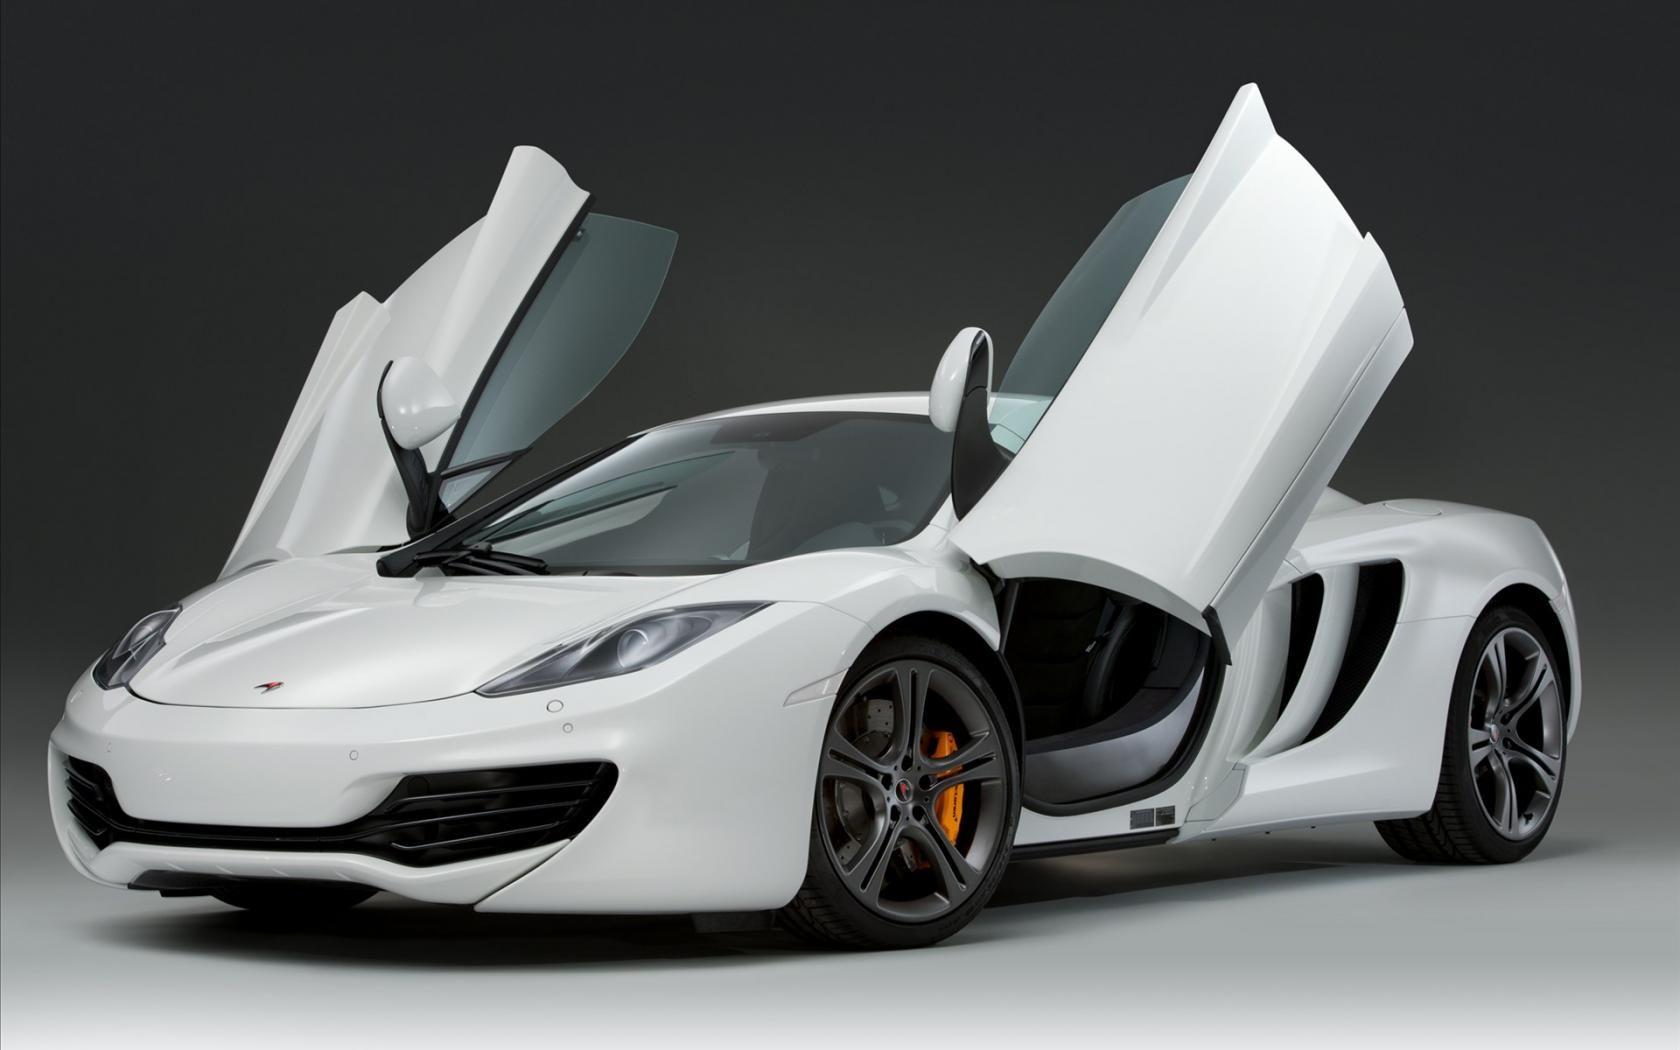 Super Sport Cars Wallpaper High Quality Resolution 6m3 Cars